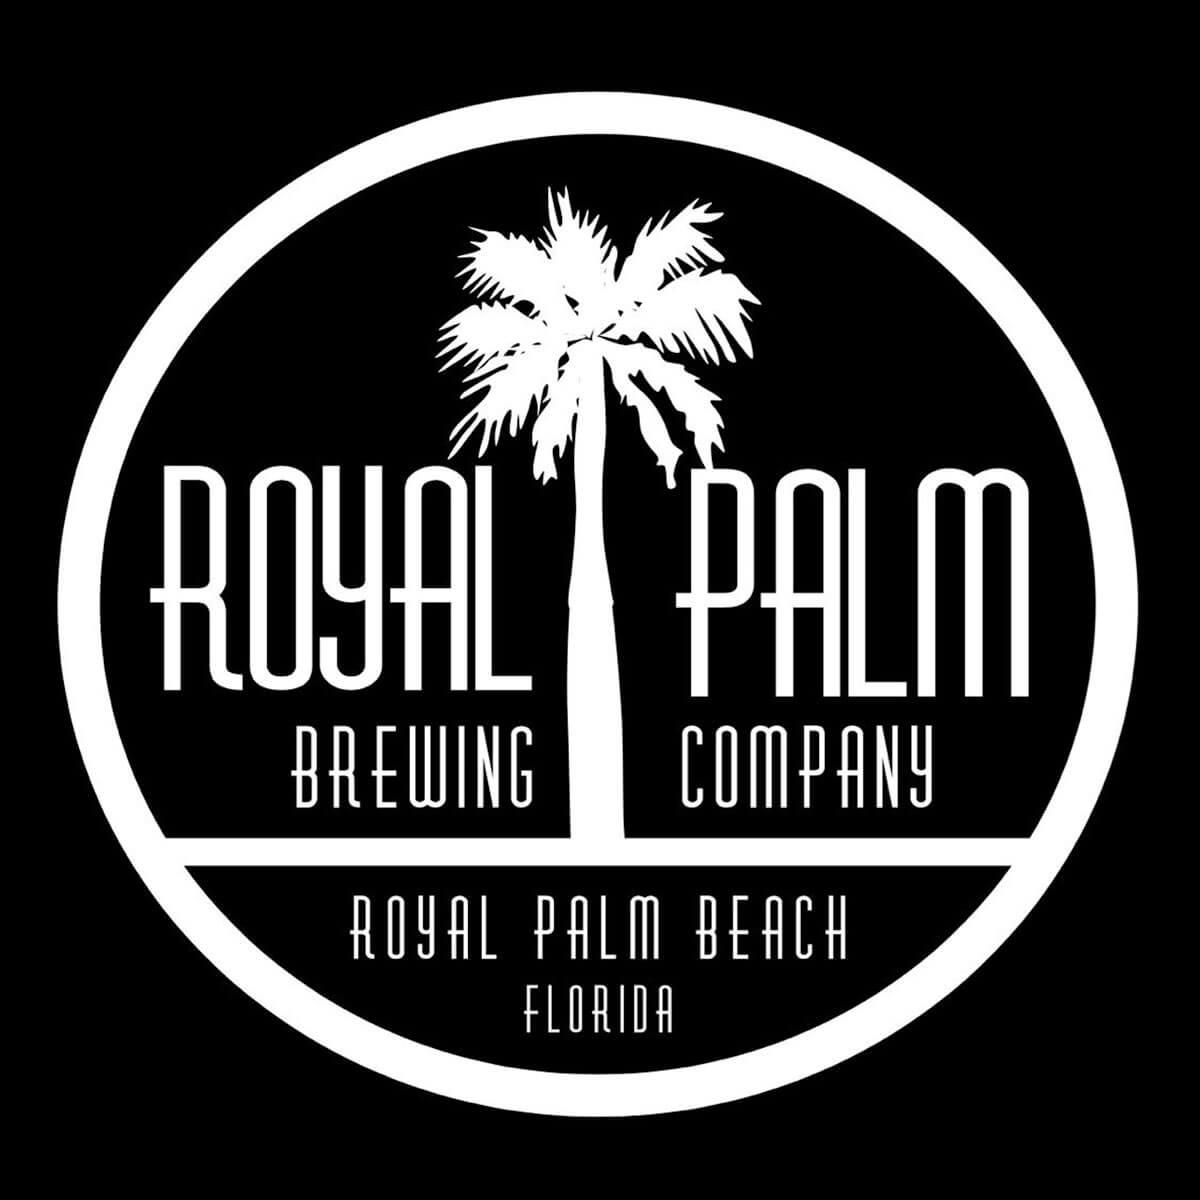 Royal Palm Brewing Company Logo